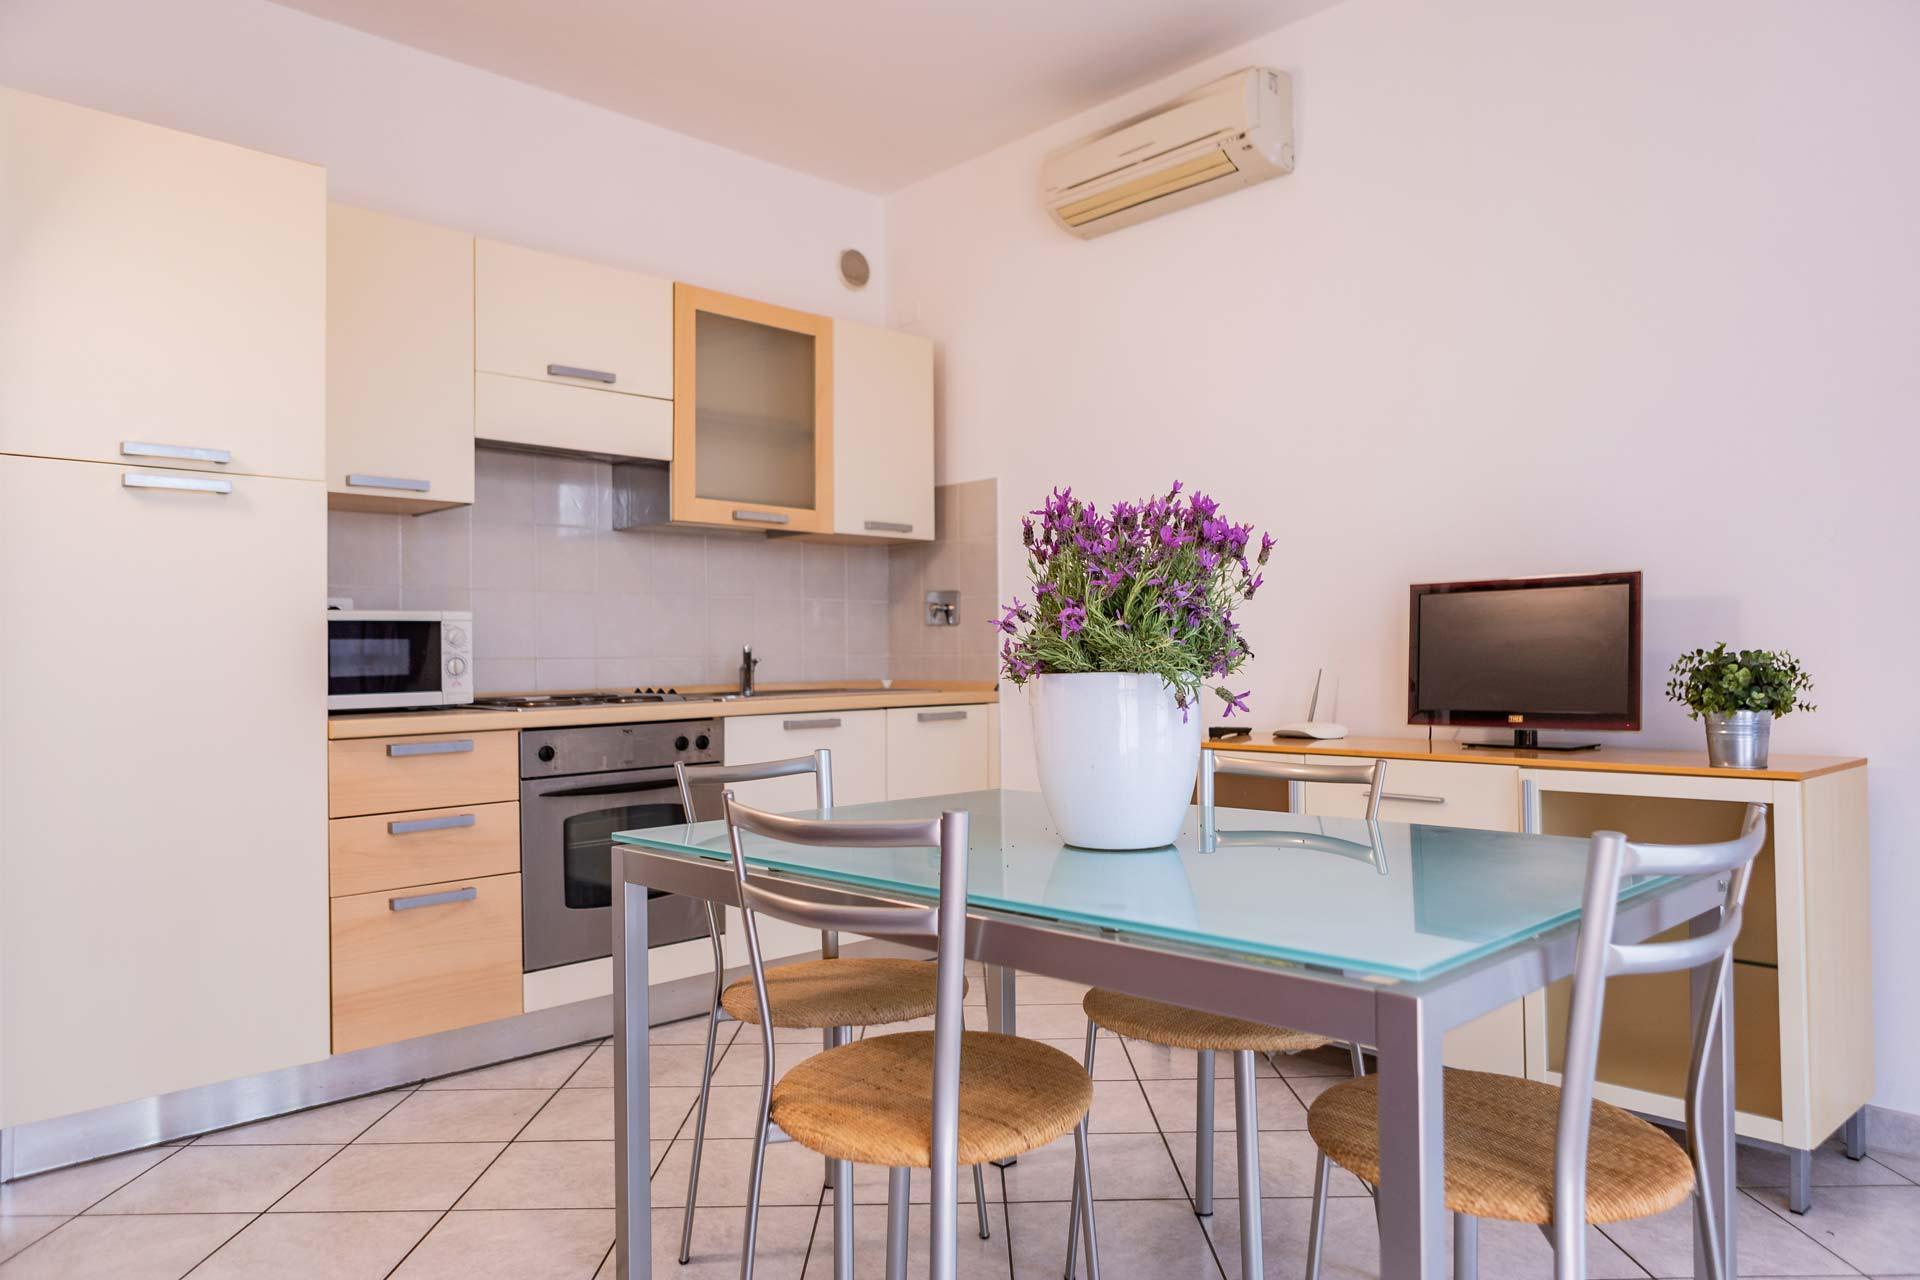 Baia blu rta residence lerici golfo dei poeti la spezia for Appartamenti lerici